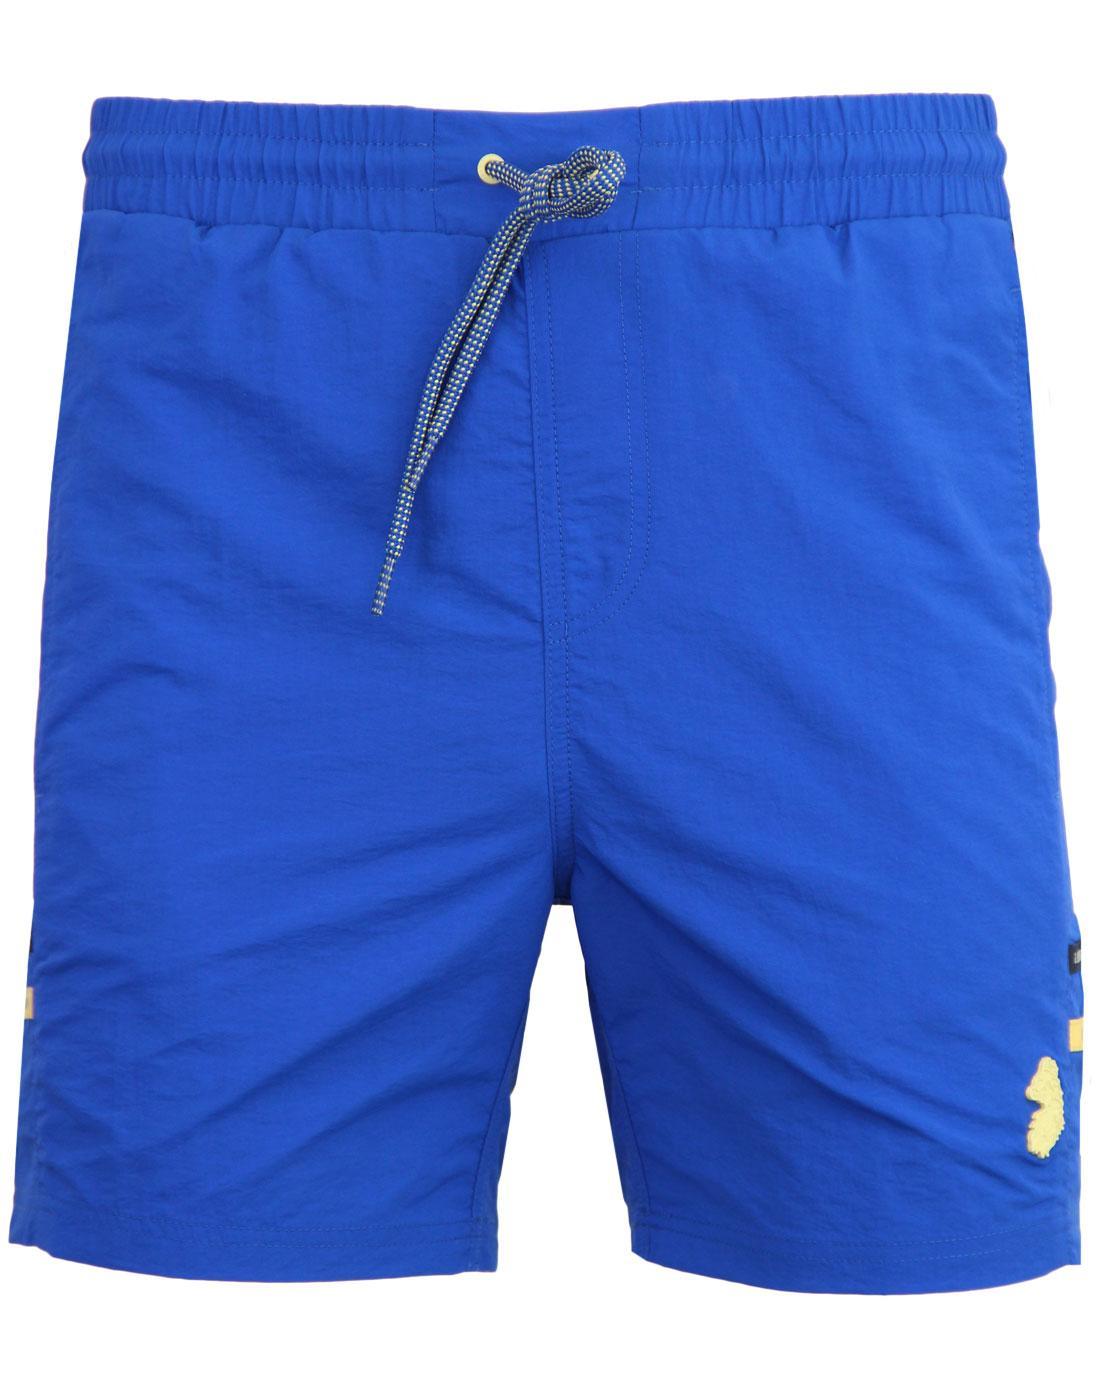 Ragy LUKE 1977 Mens Indie Summer Swim Shorts BLUE